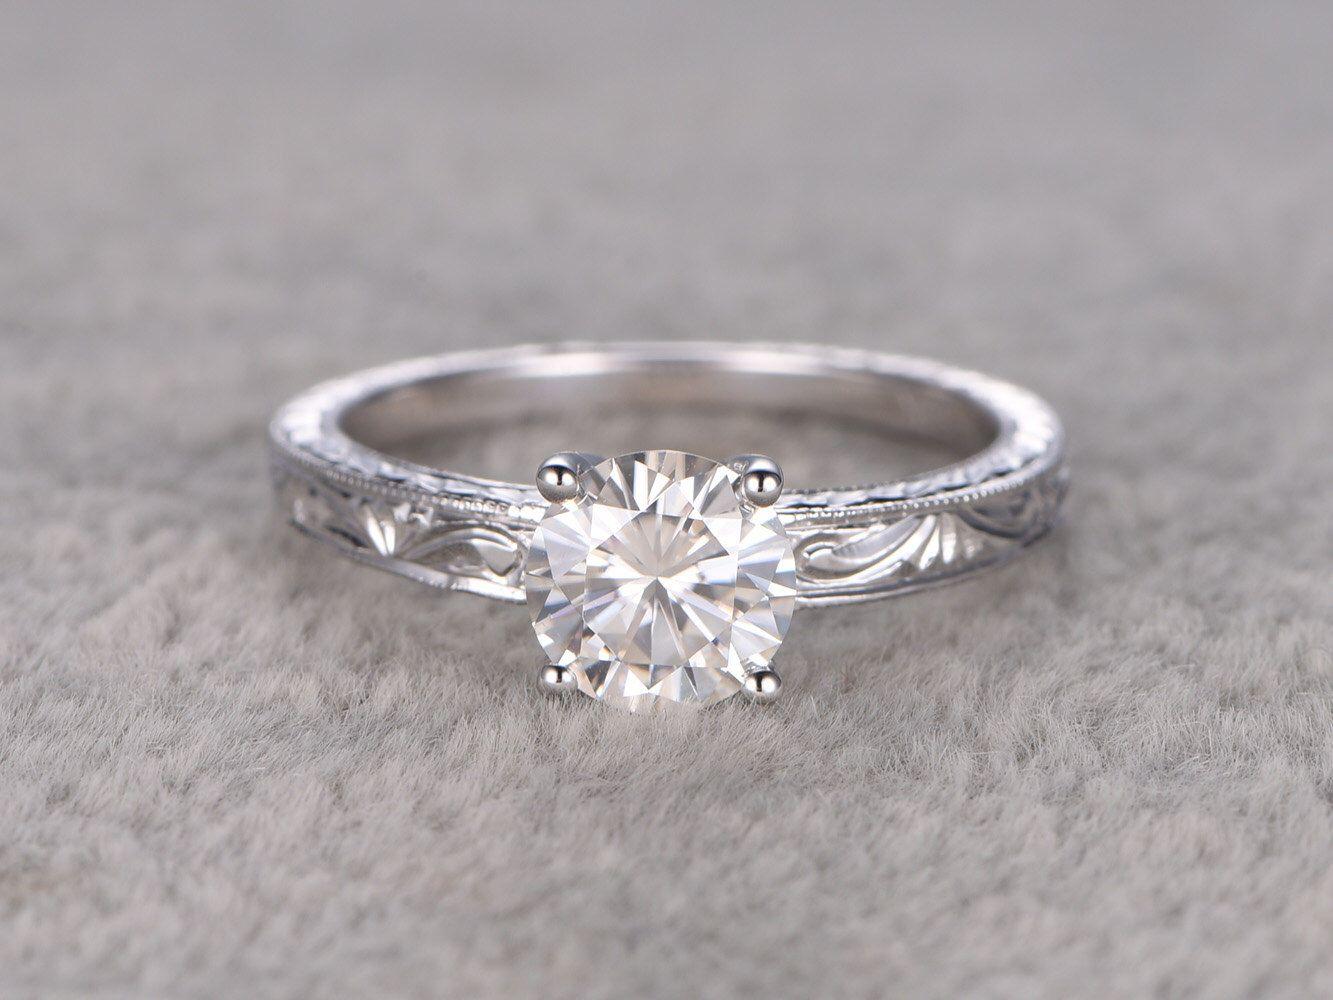 Ct brilliant moissanite engagement ring white goldsolitaire